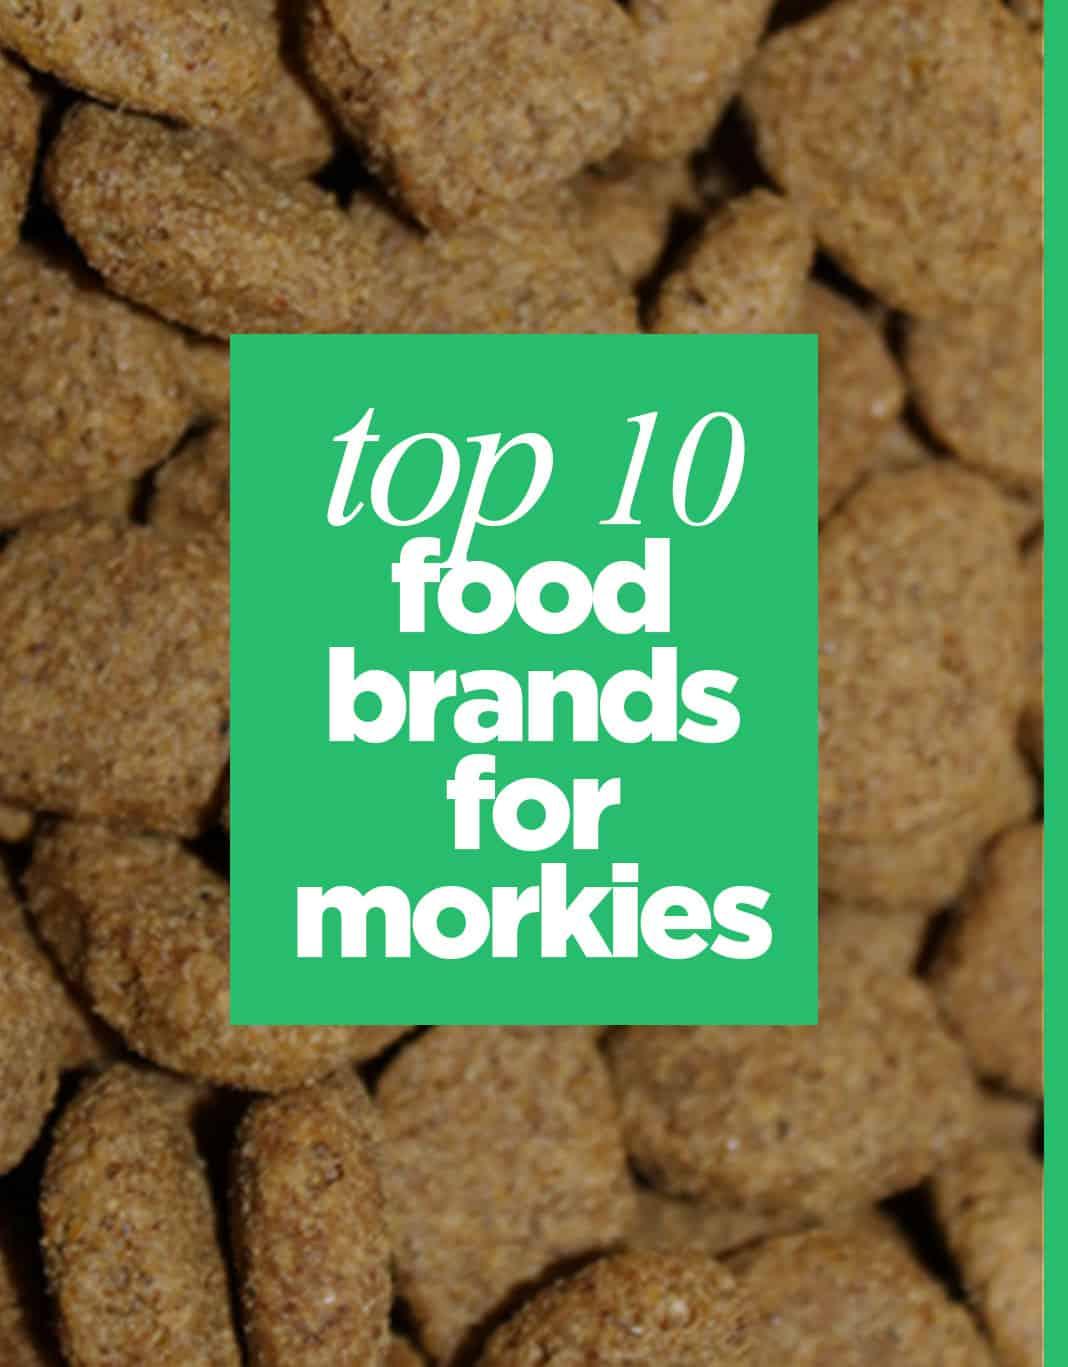 Orijen Dog Food Reviews >> Top 10 Best Food Brands For Morkie Dogs - The Morkie Guide